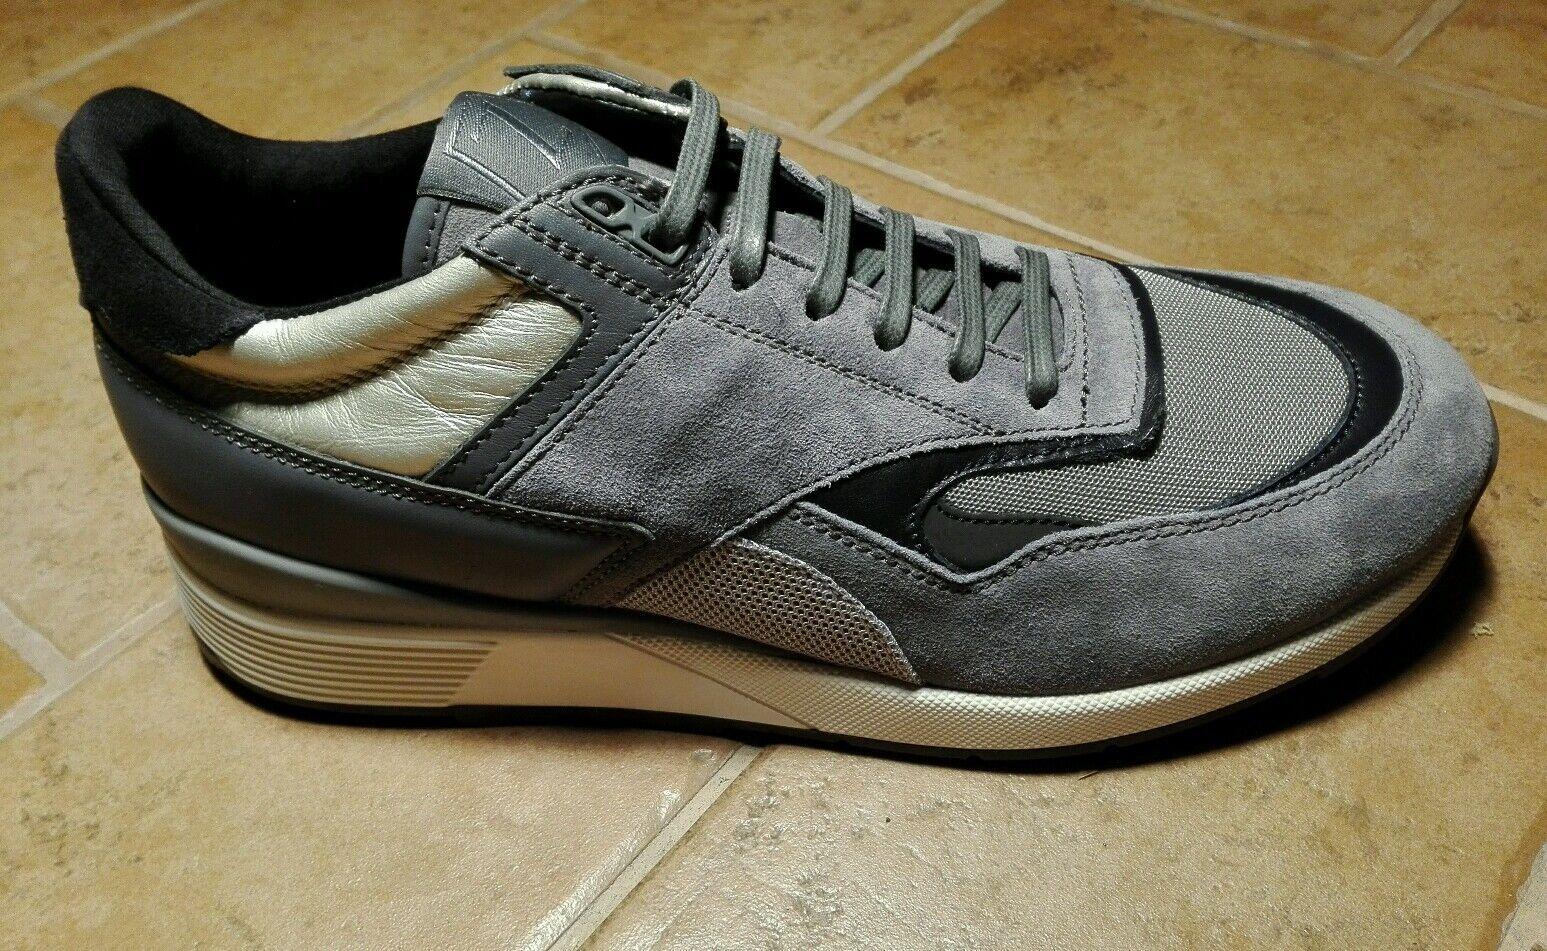 zapatos Zeta Zegna n. 44 (10 eu 11us) nuove